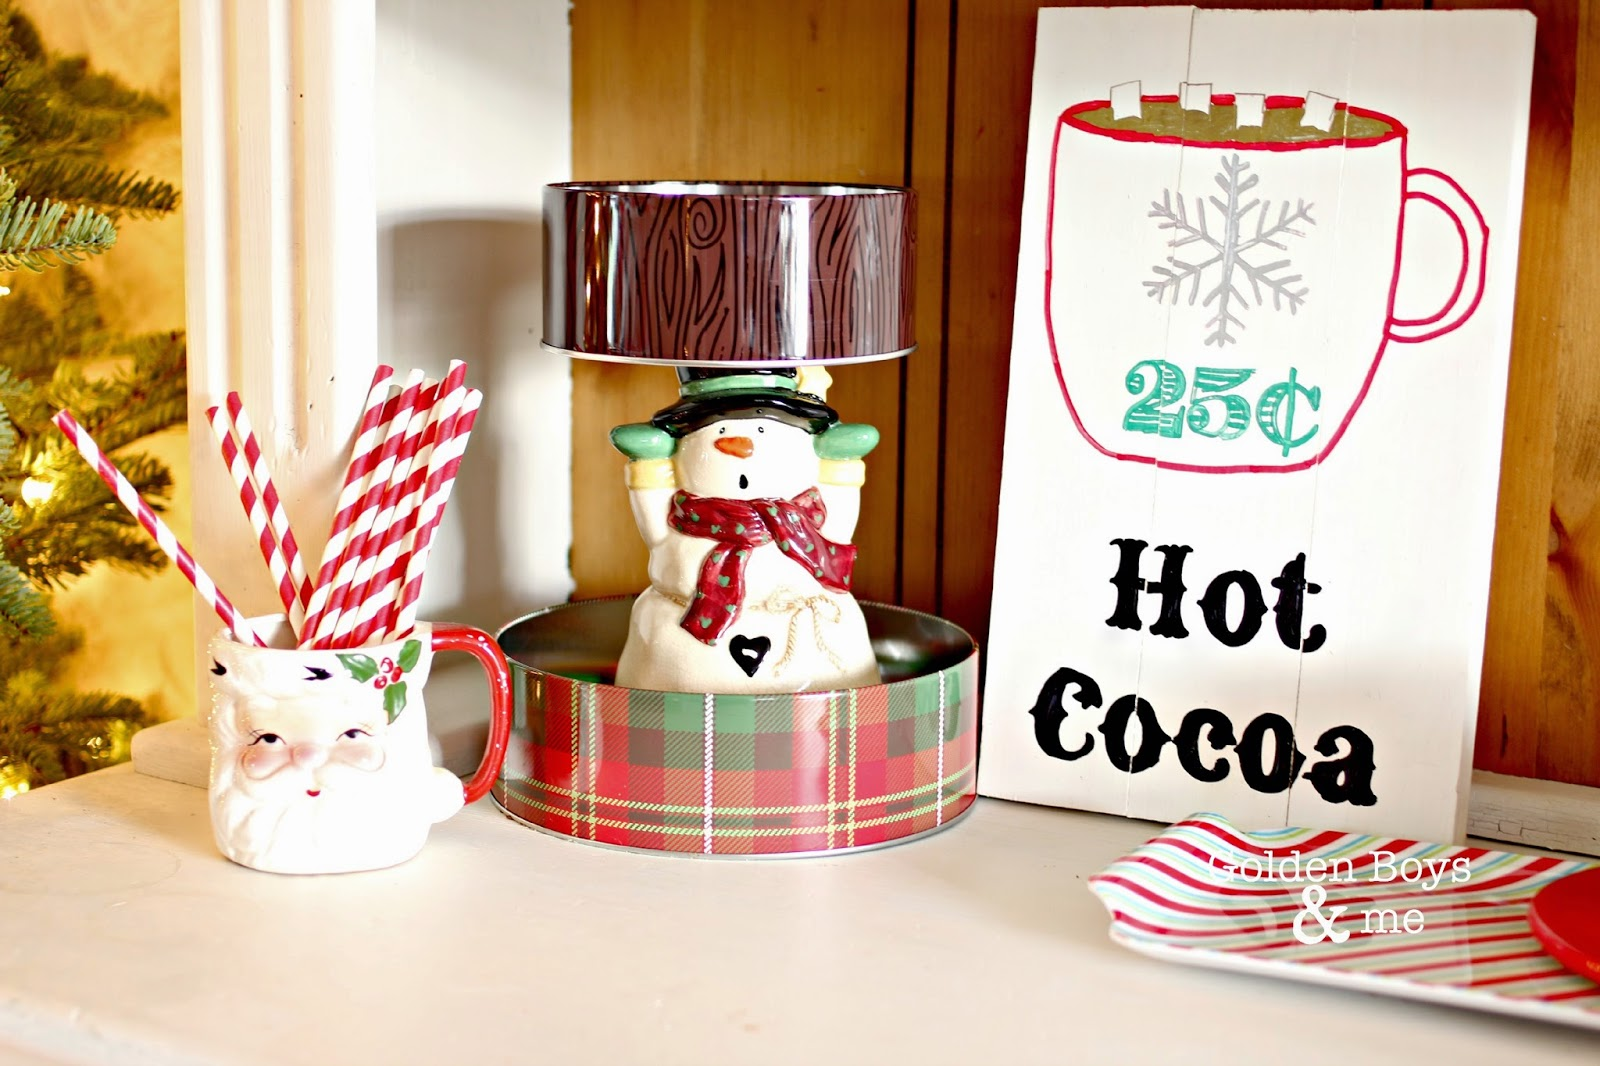 Christmas hutch-www.goldenboysandme.com